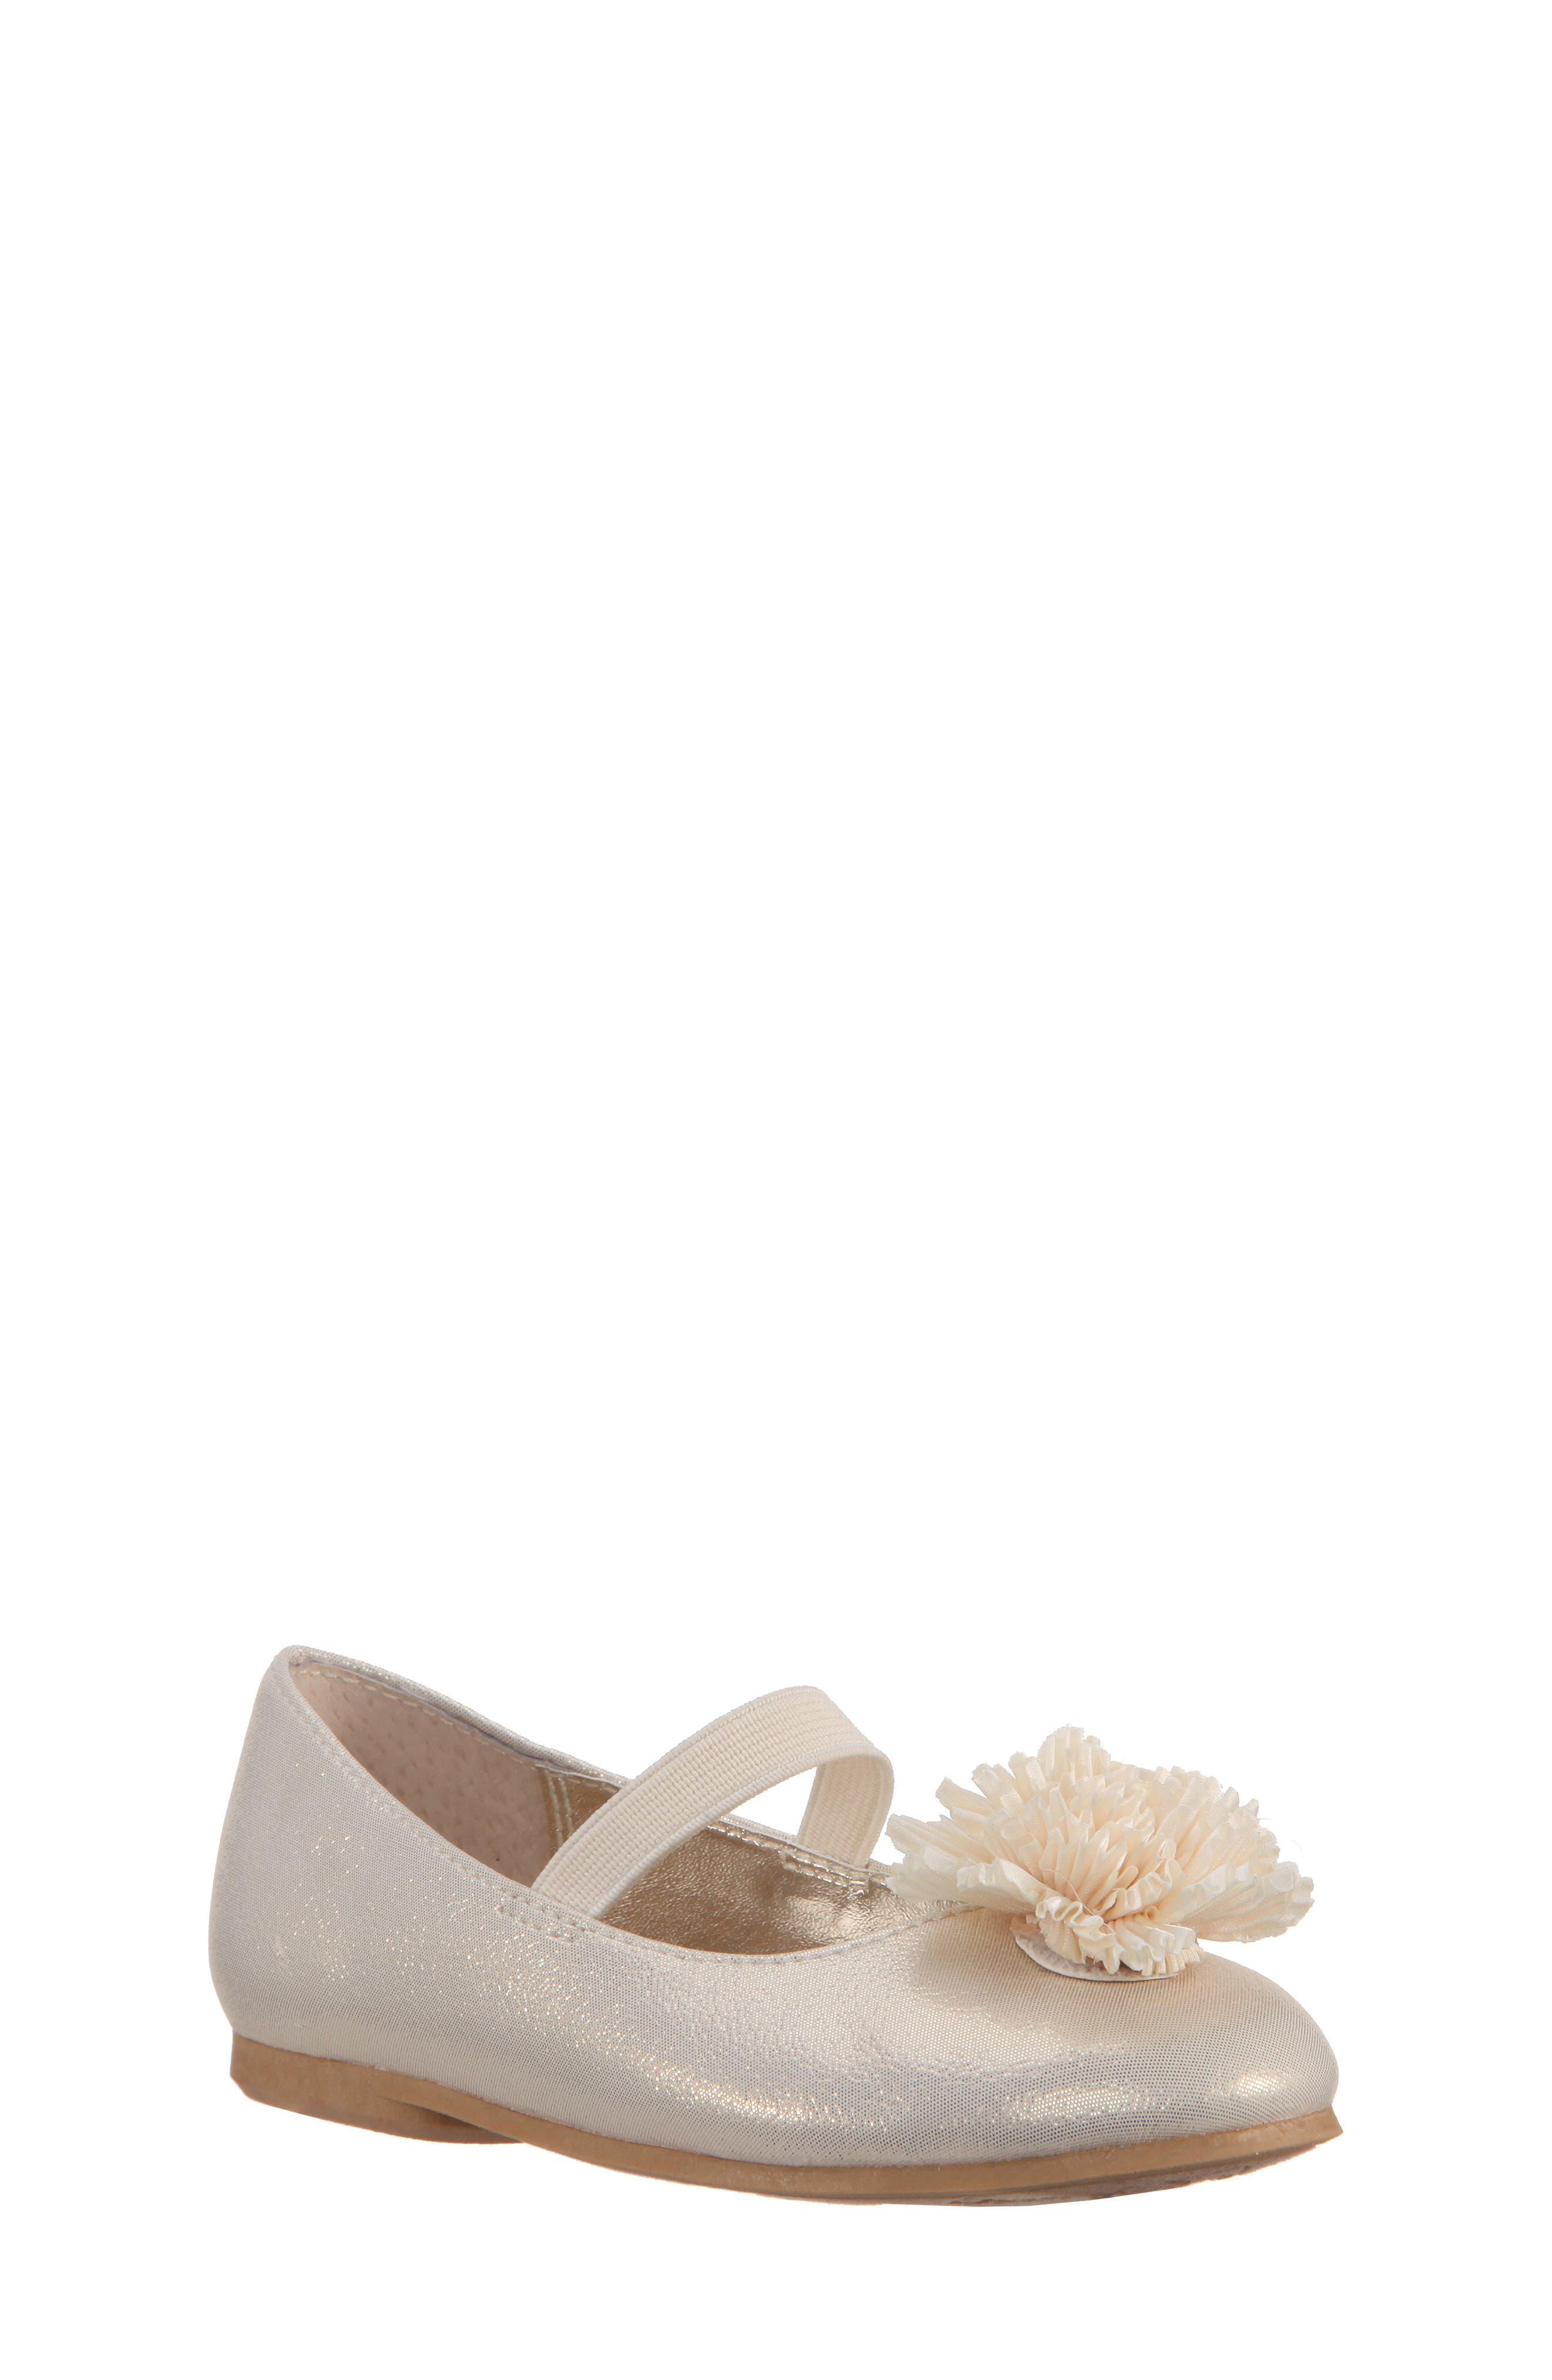 Jemma-T Bow Ballet Flat,                         Main,                         color, Platino Metallic